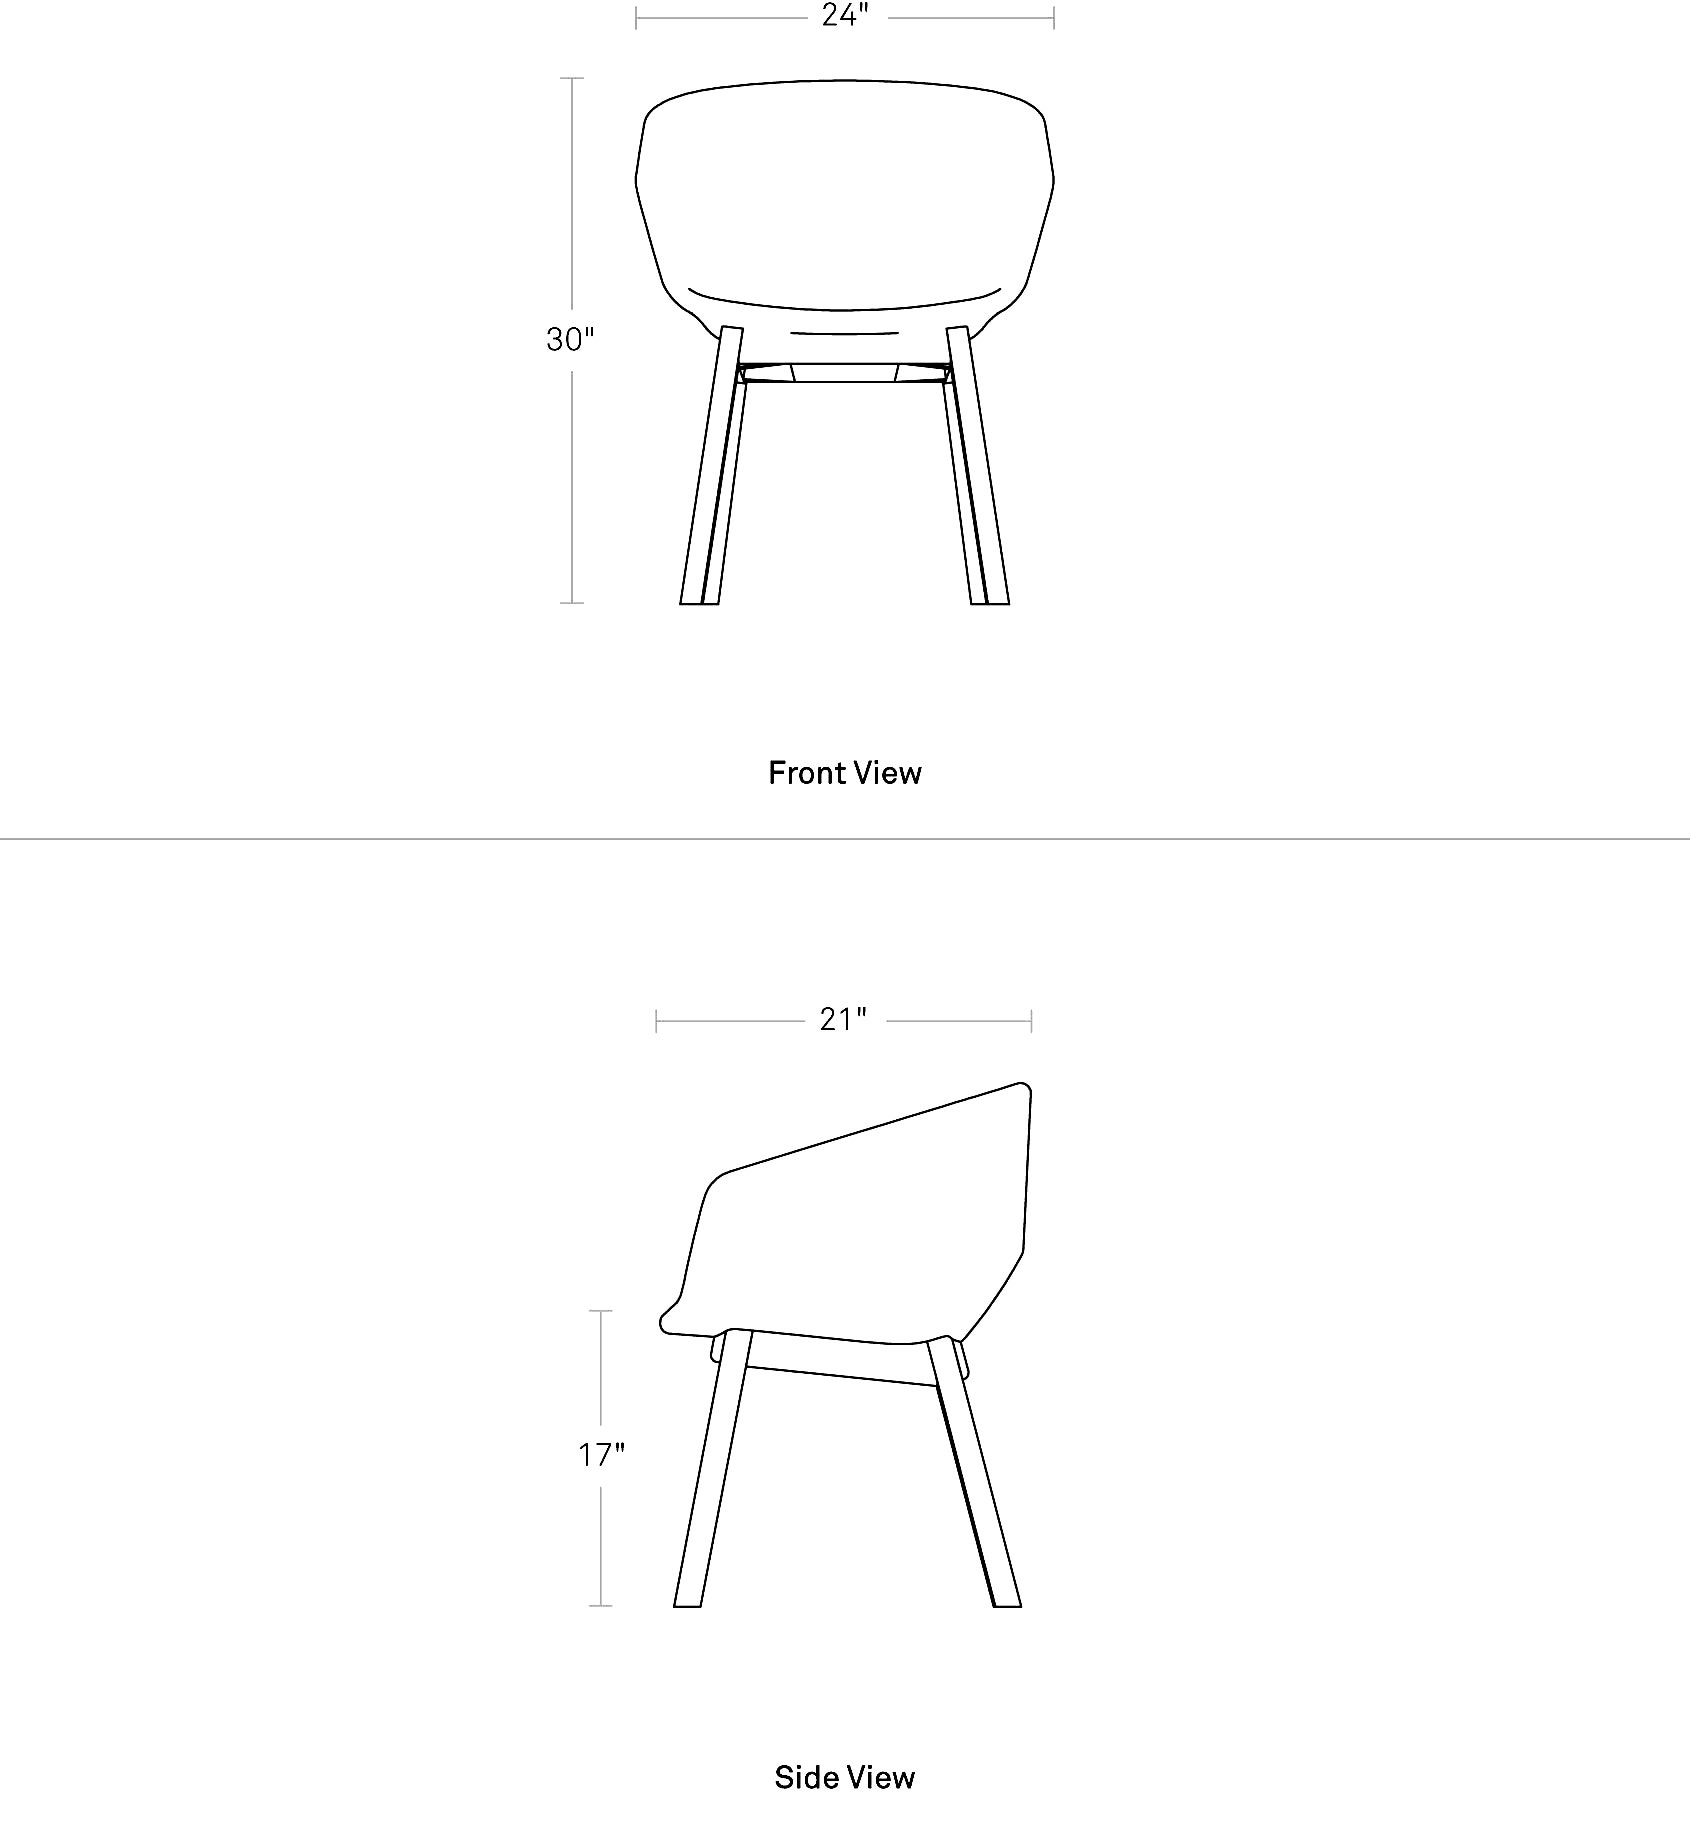 Excellent Host Modern Upholstered Dining Room Chair Blu Dot Beatyapartments Chair Design Images Beatyapartmentscom